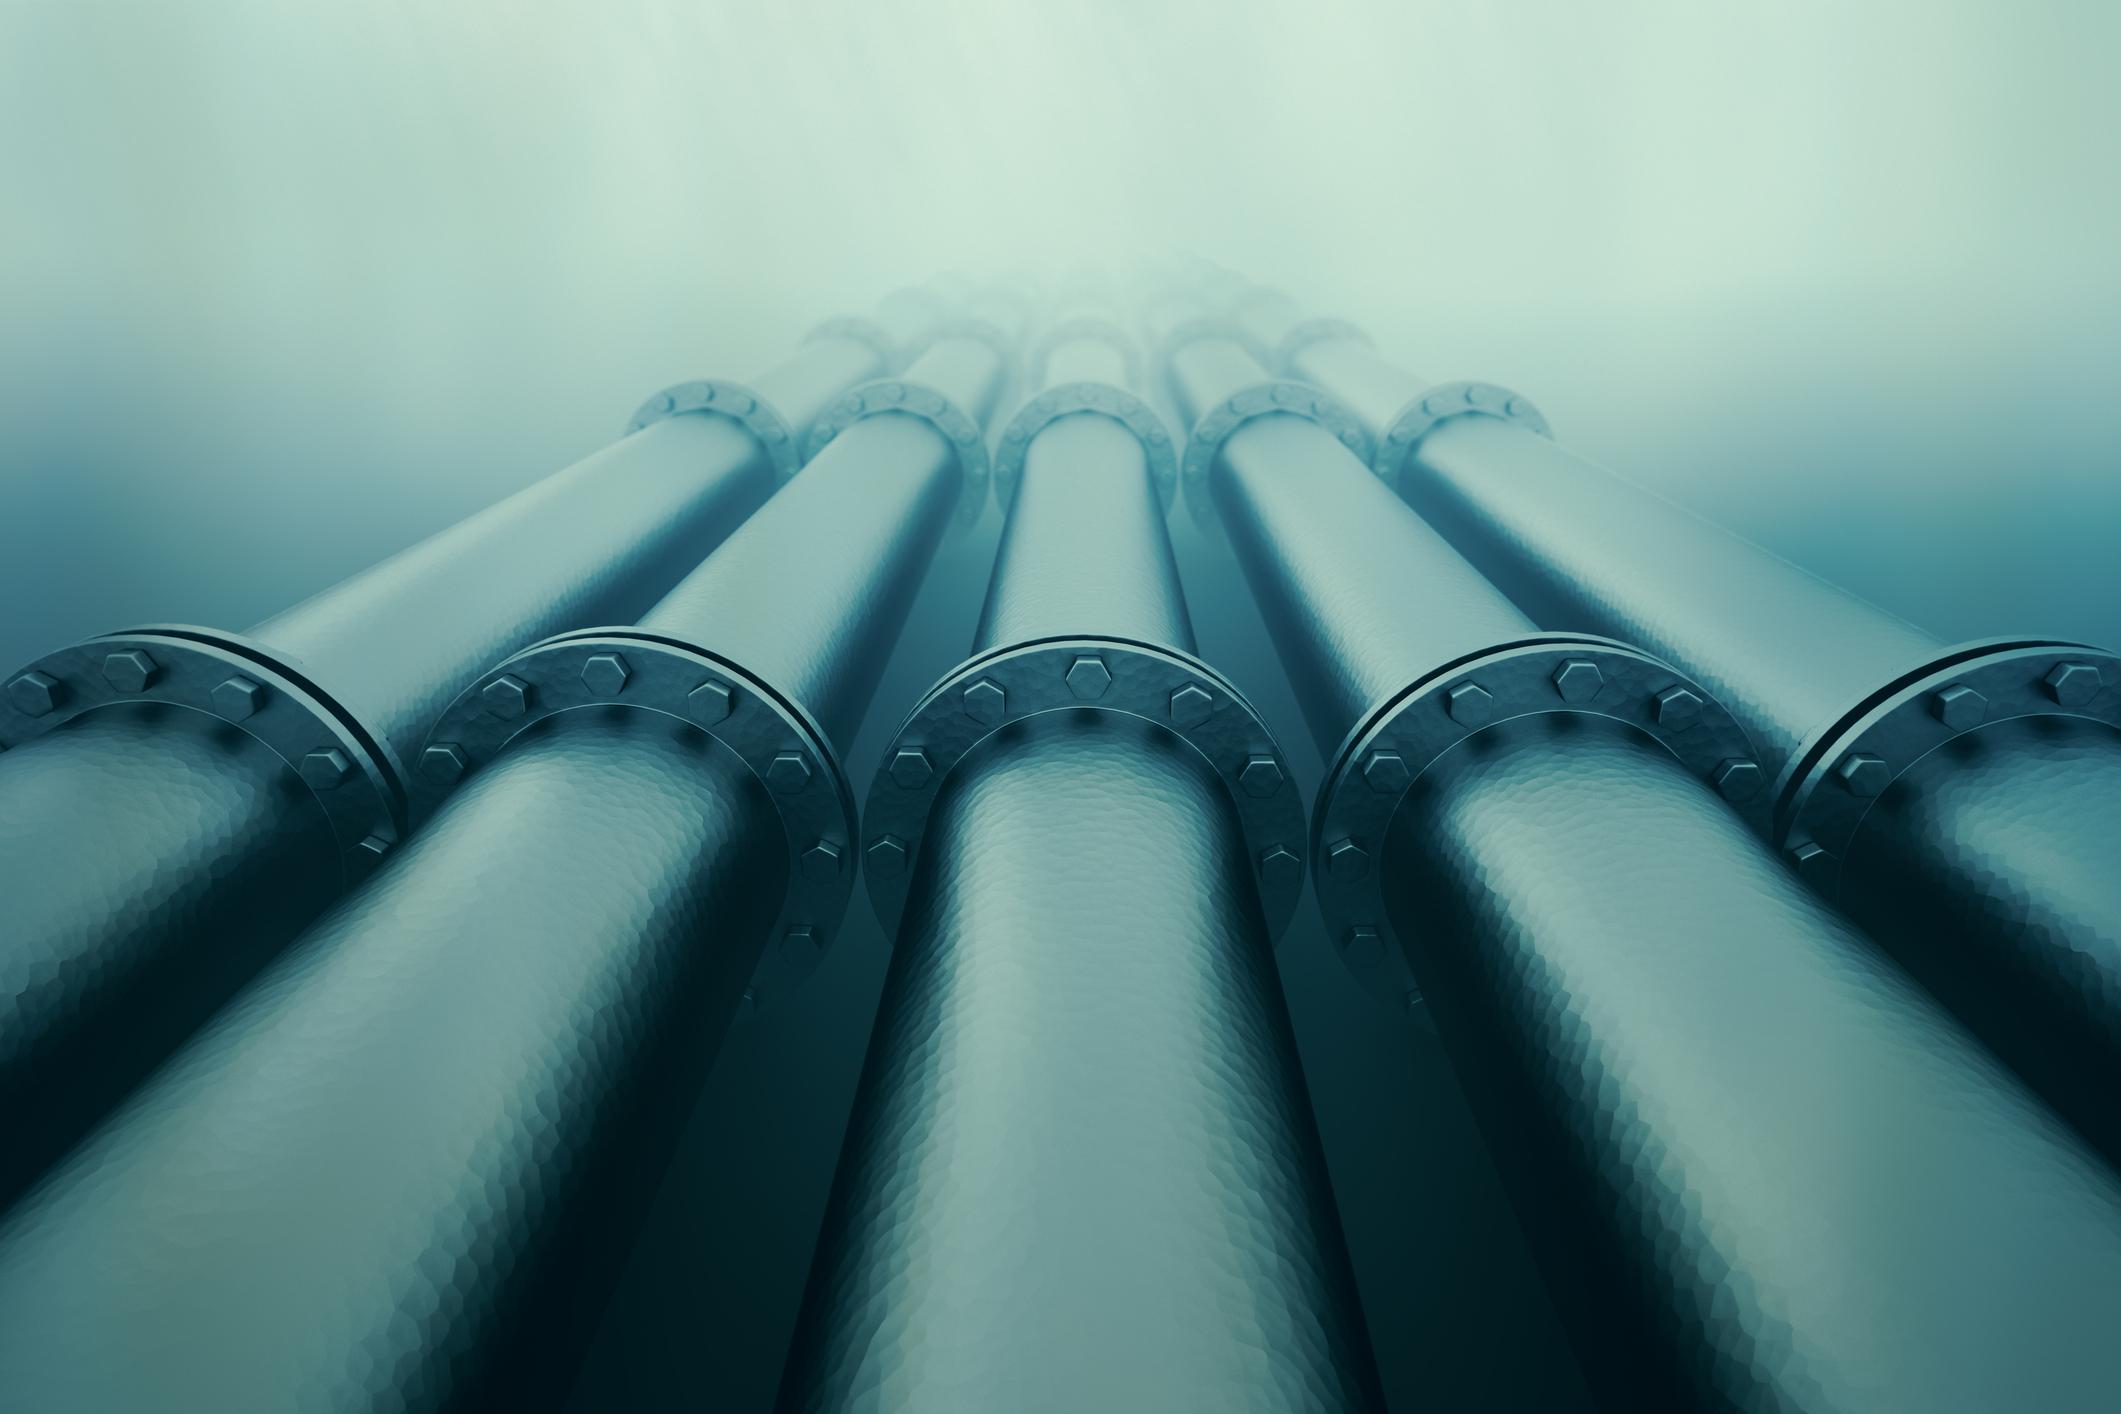 Pipelines underwater.